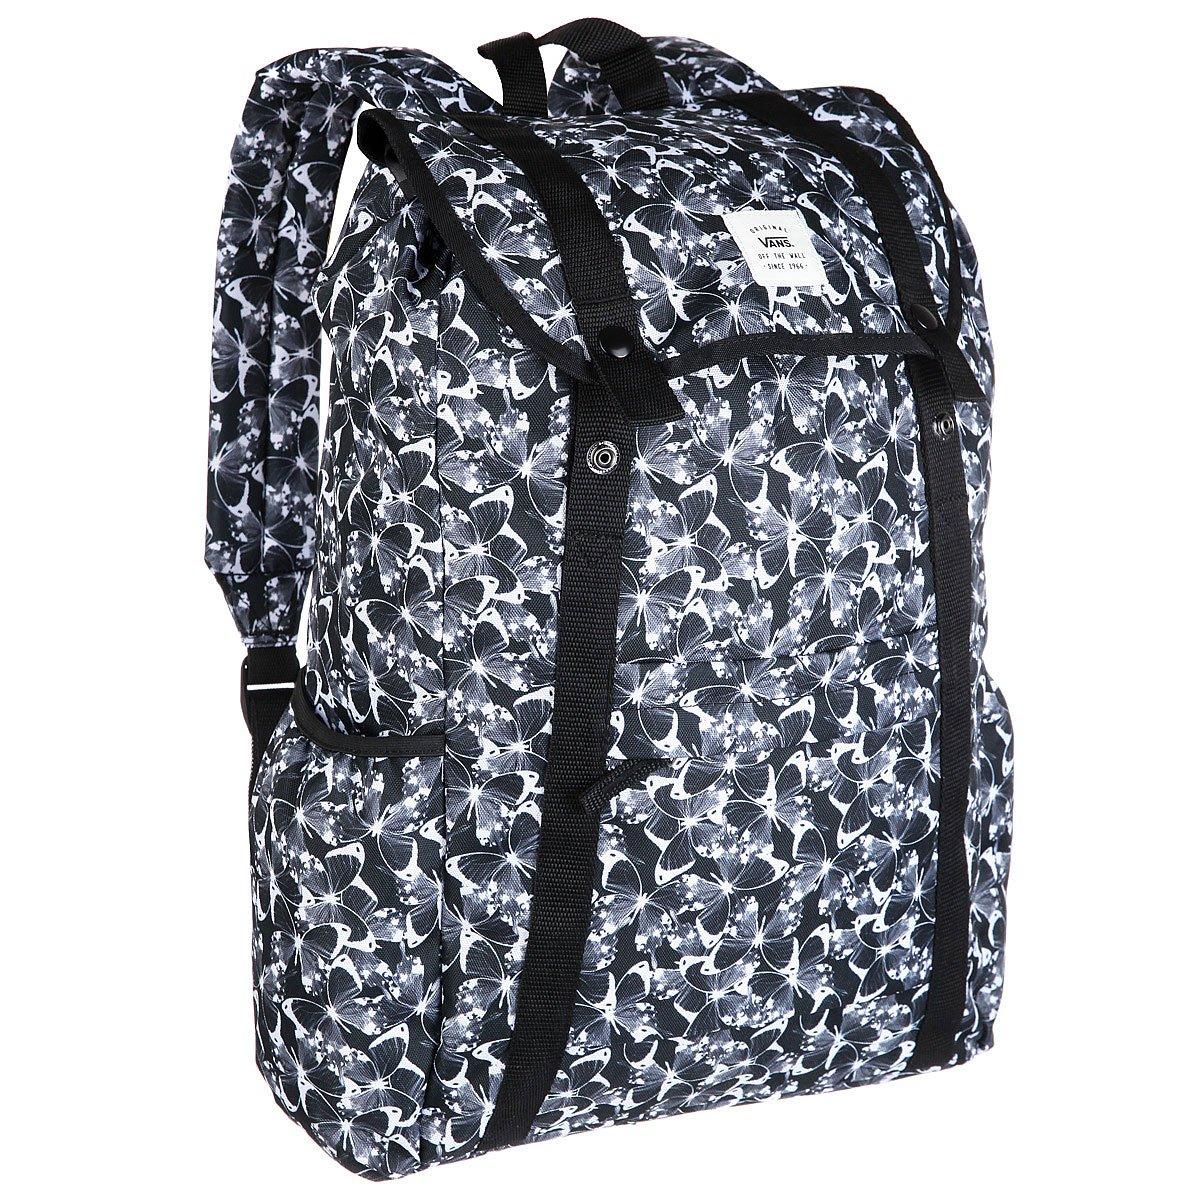 fbe6a6f6e9a8a Купить рюкзак туристический женский Vans Caravaner Backpac Butterfly ...